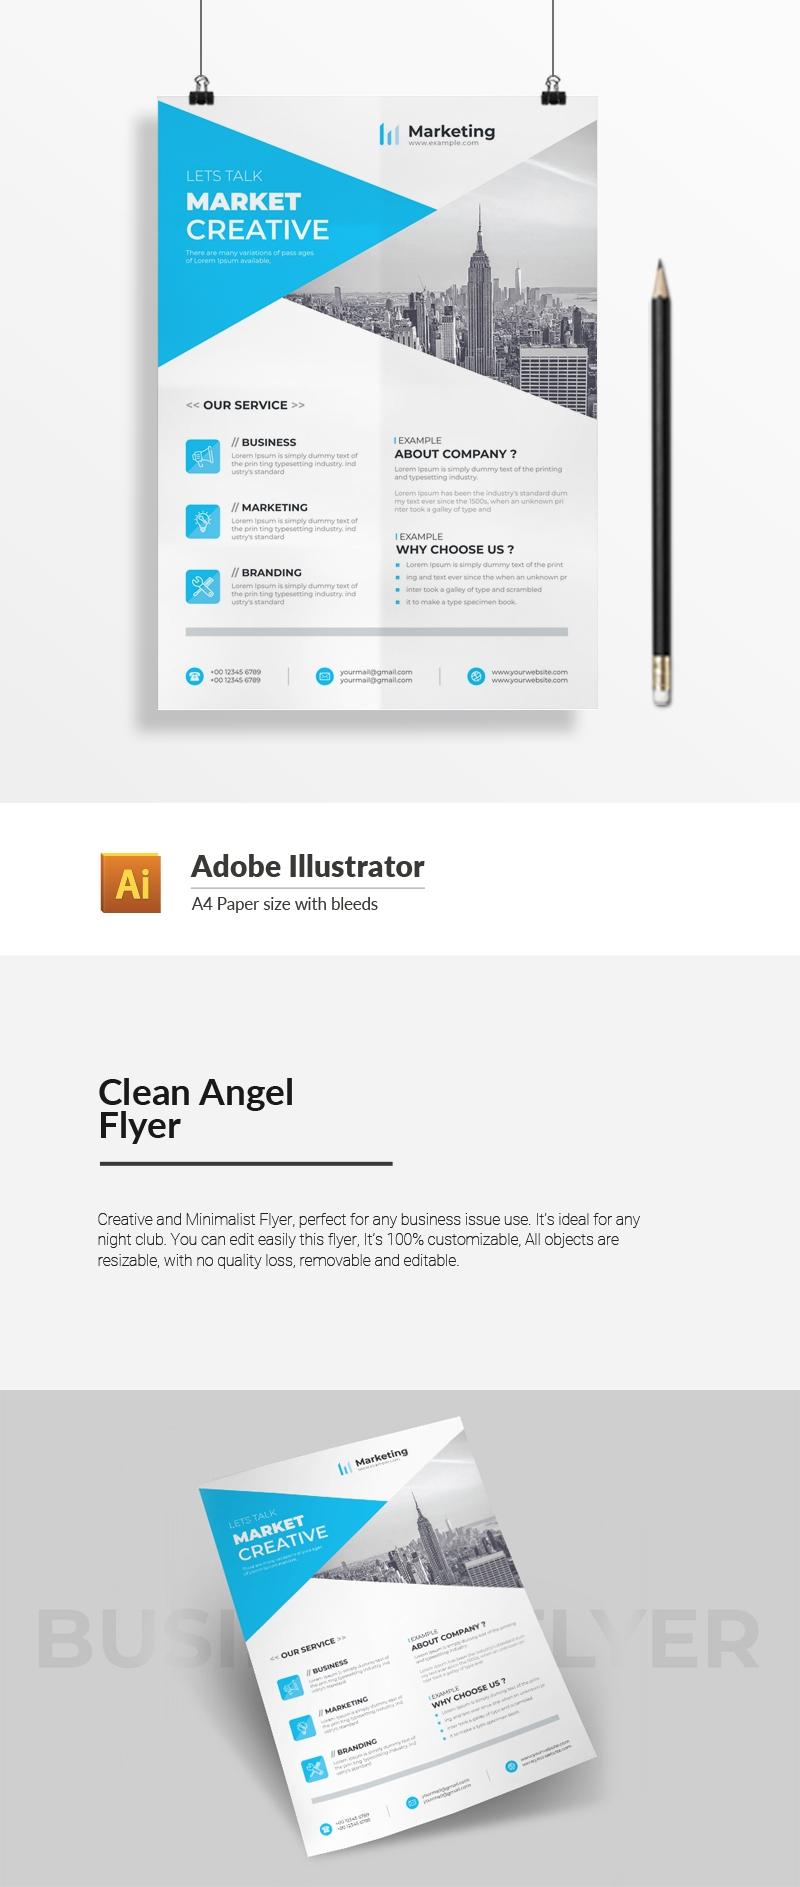 Clean Angel Flyer